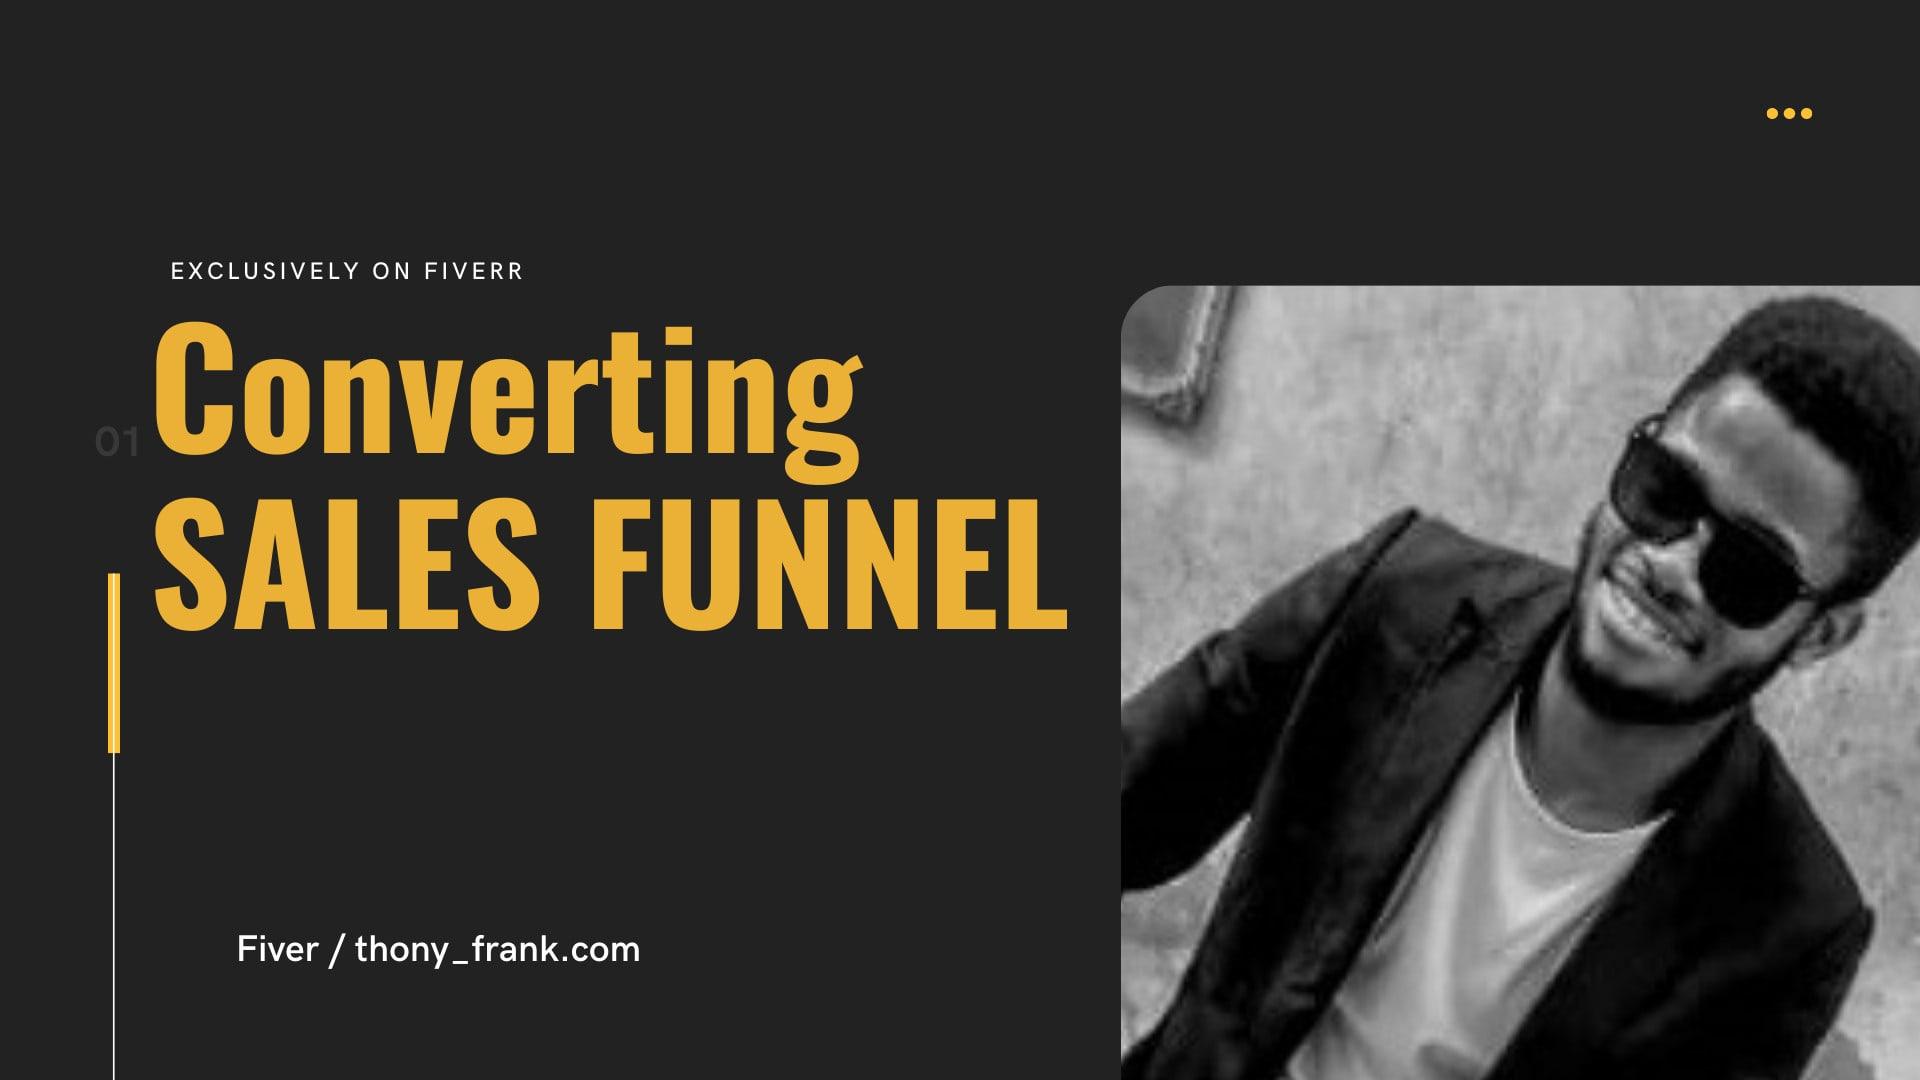 I will do clickfunnels, samcart, thrivecart kajabi, shopify sales funnel marketing, FiverrBox